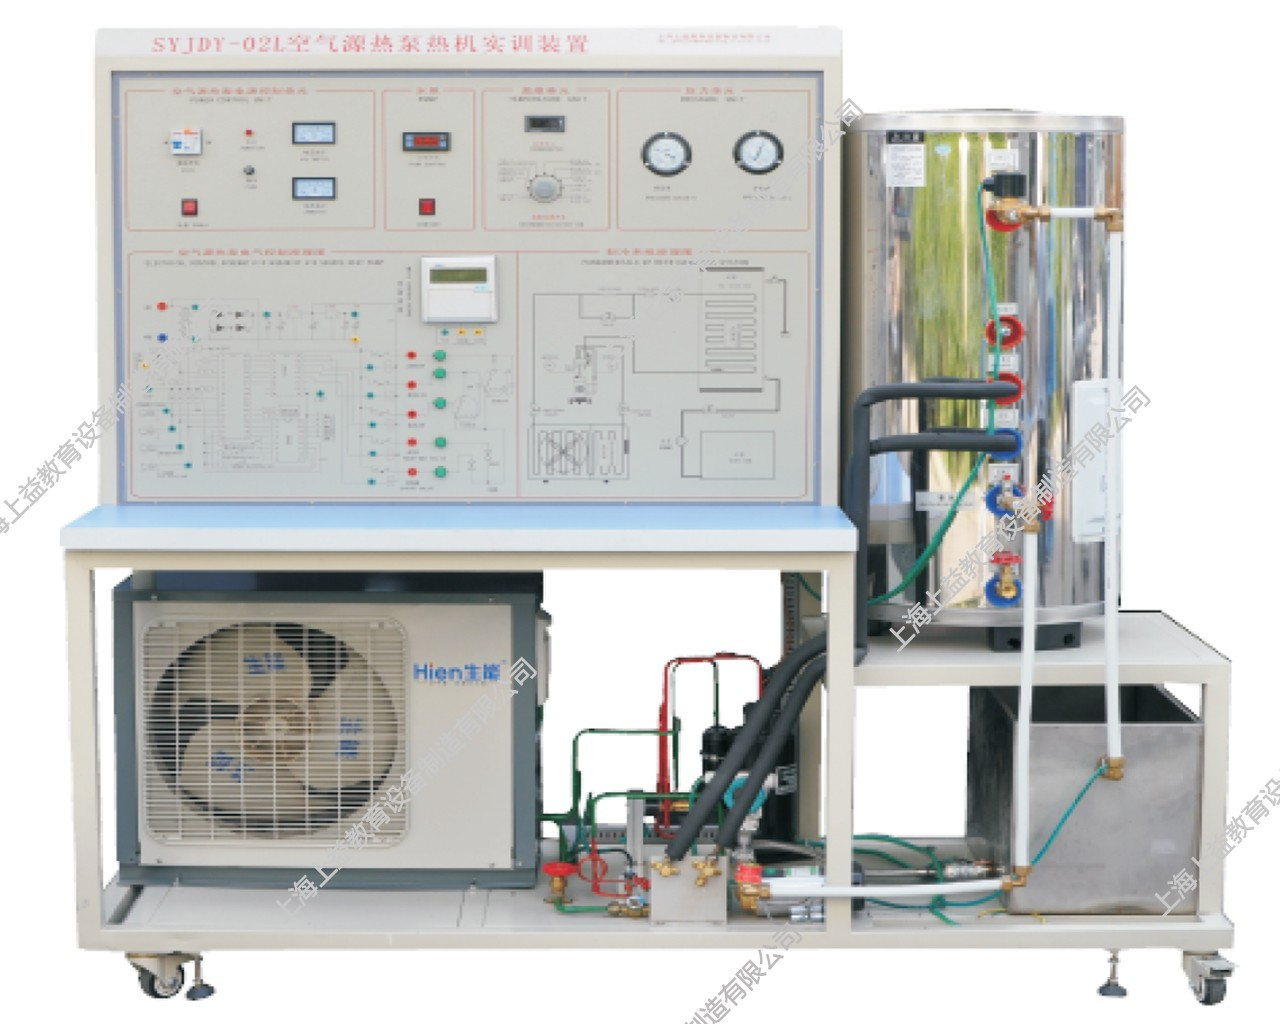 SYJYD-02L 空气源热泵wwwlehu8viplehu68vip装置